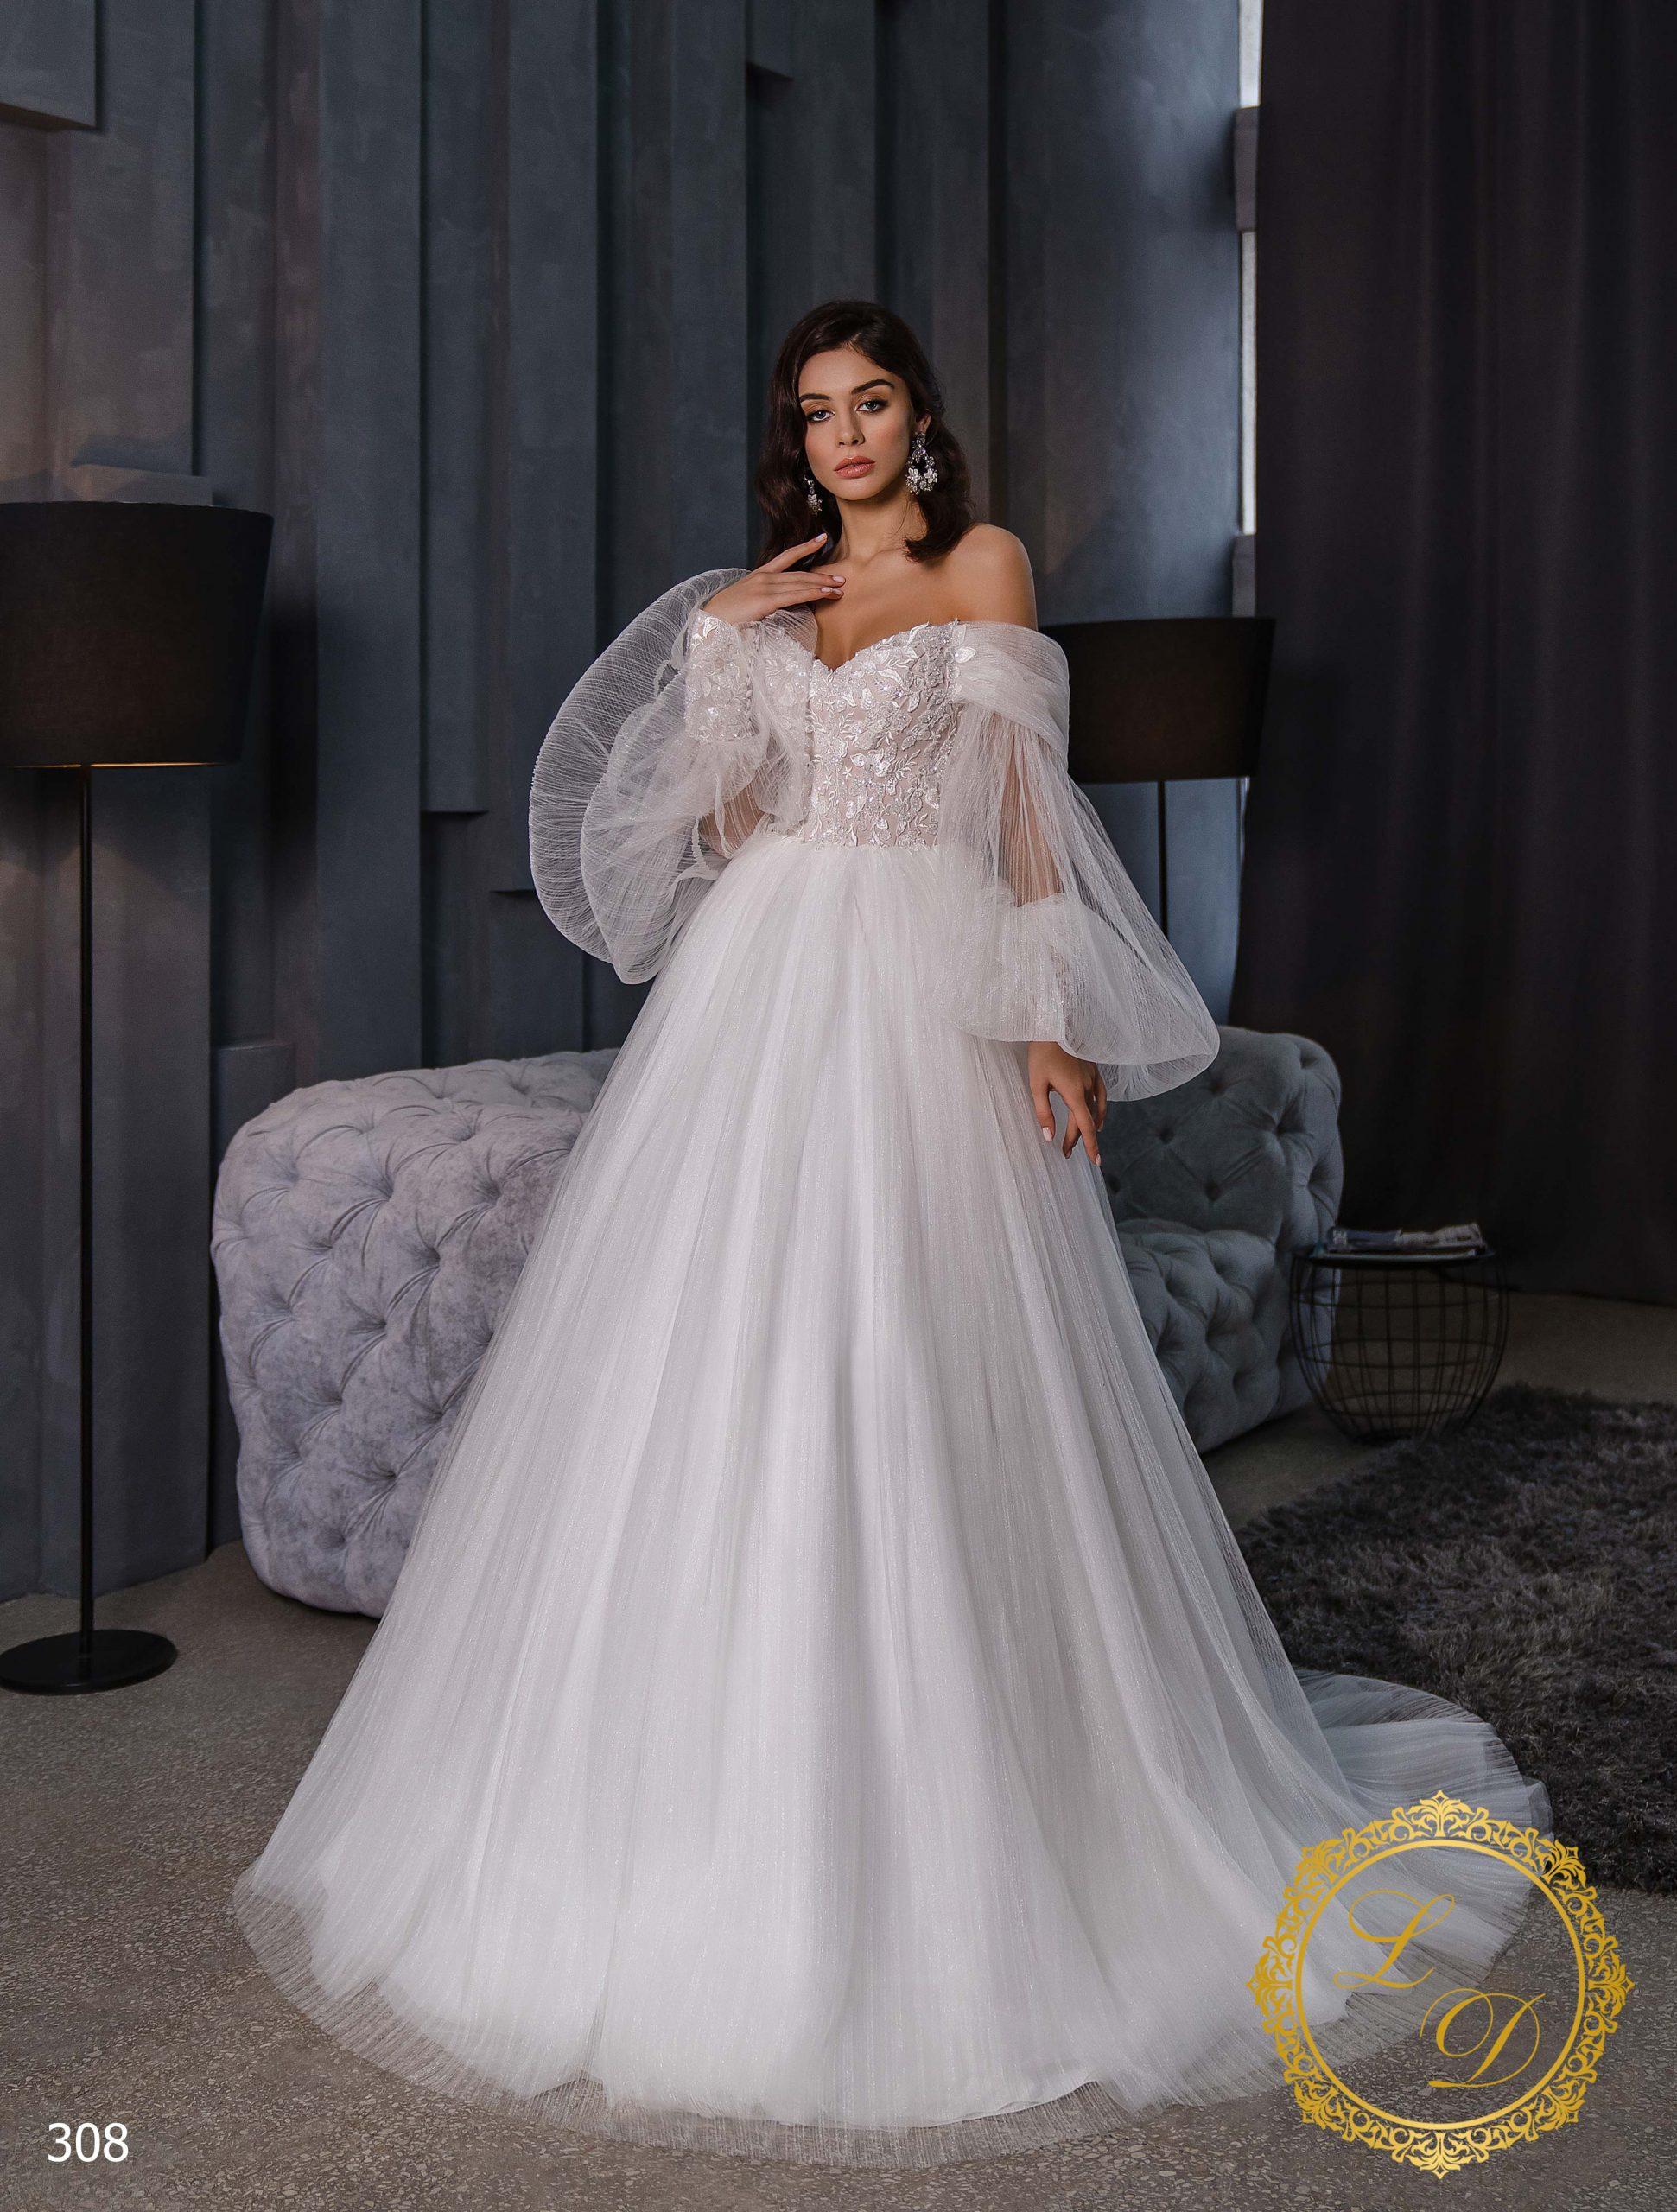 Wedding Dress Lady Di 308